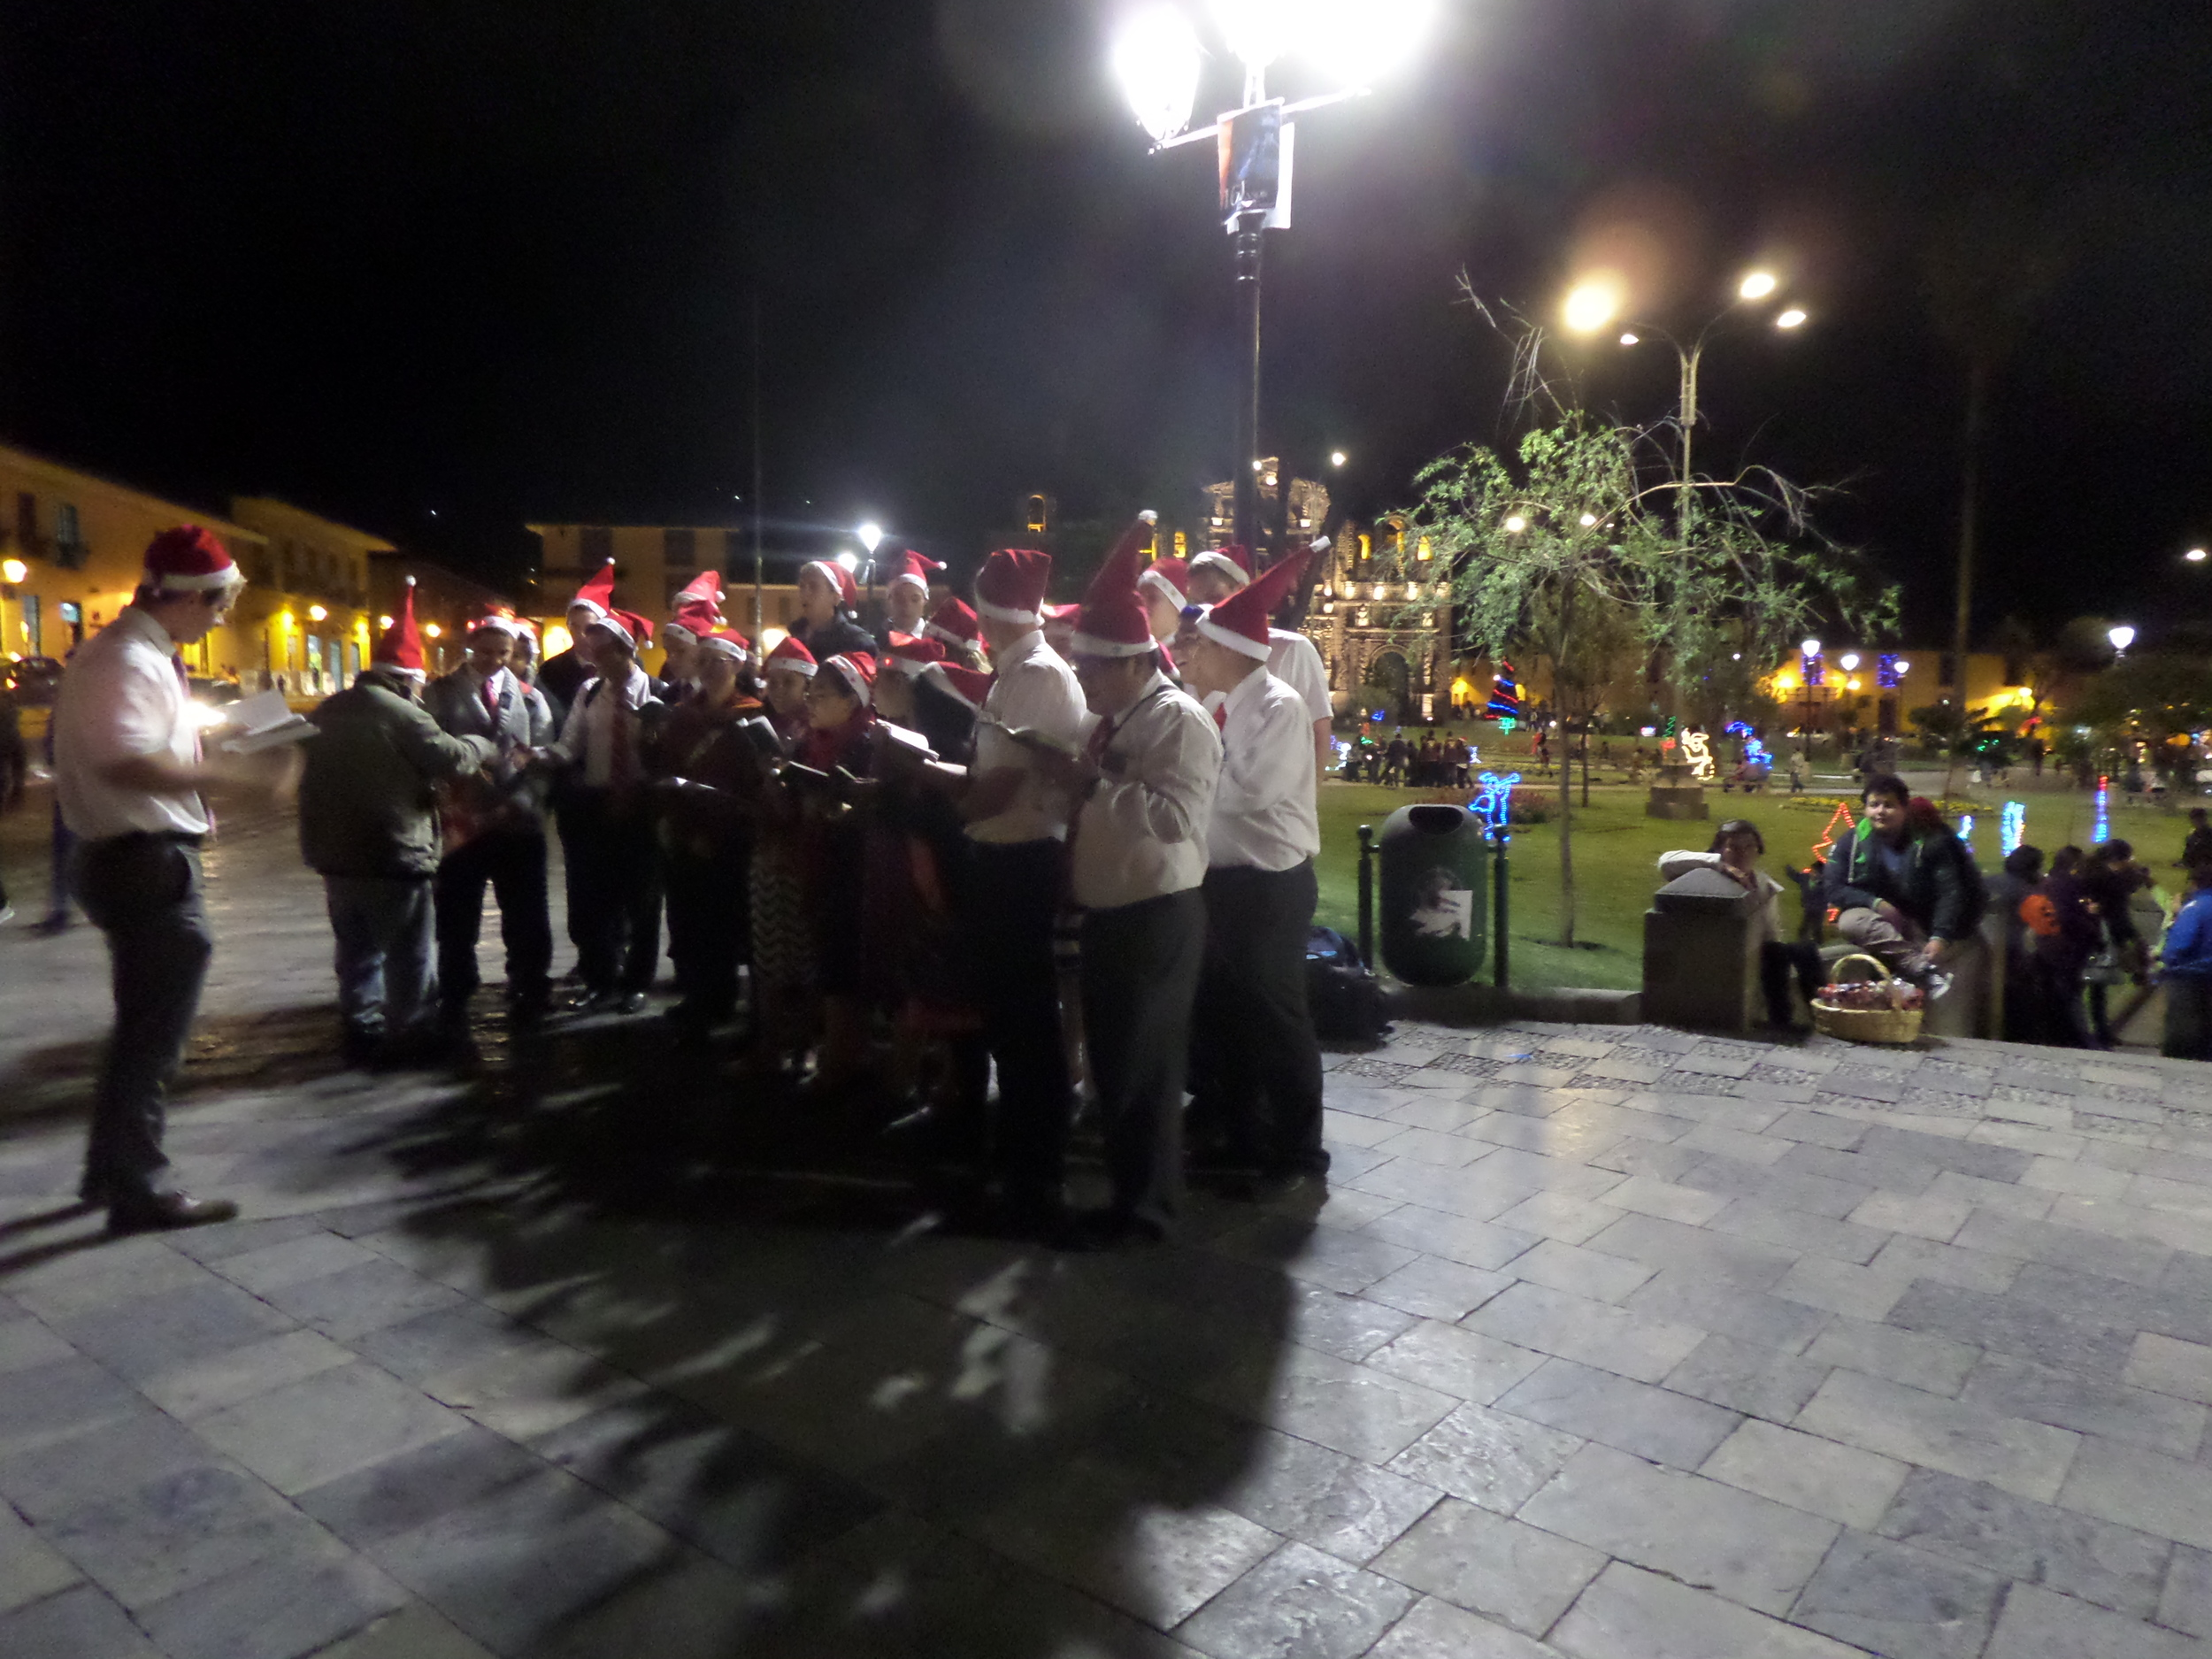 Two zones singing, bringing holiday cheer!